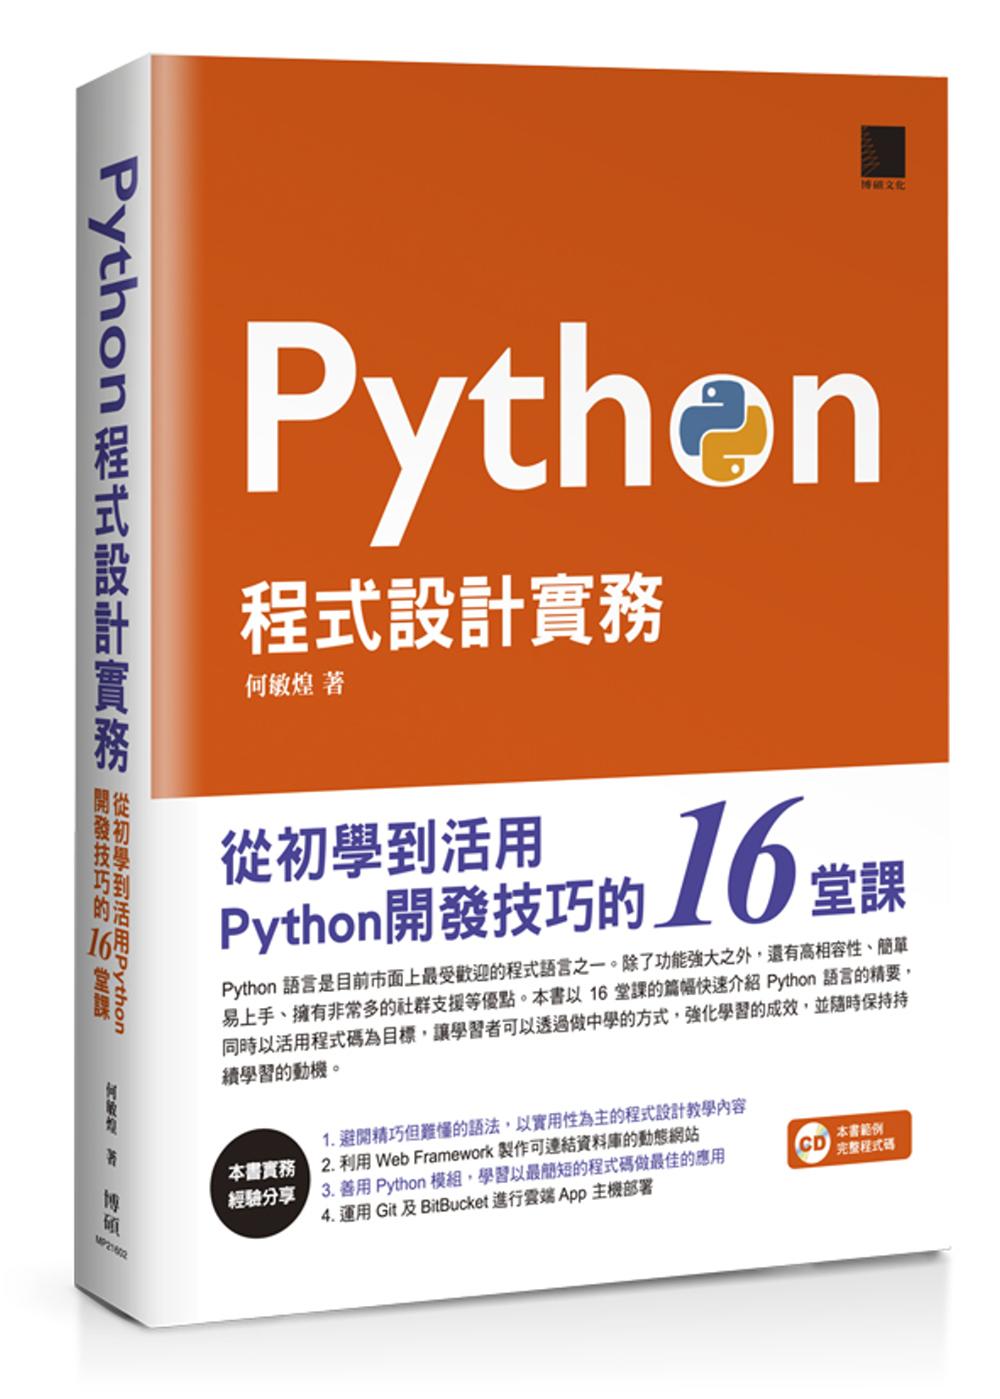 Python程式 實務:從初學到活用Python開發技巧的16堂課